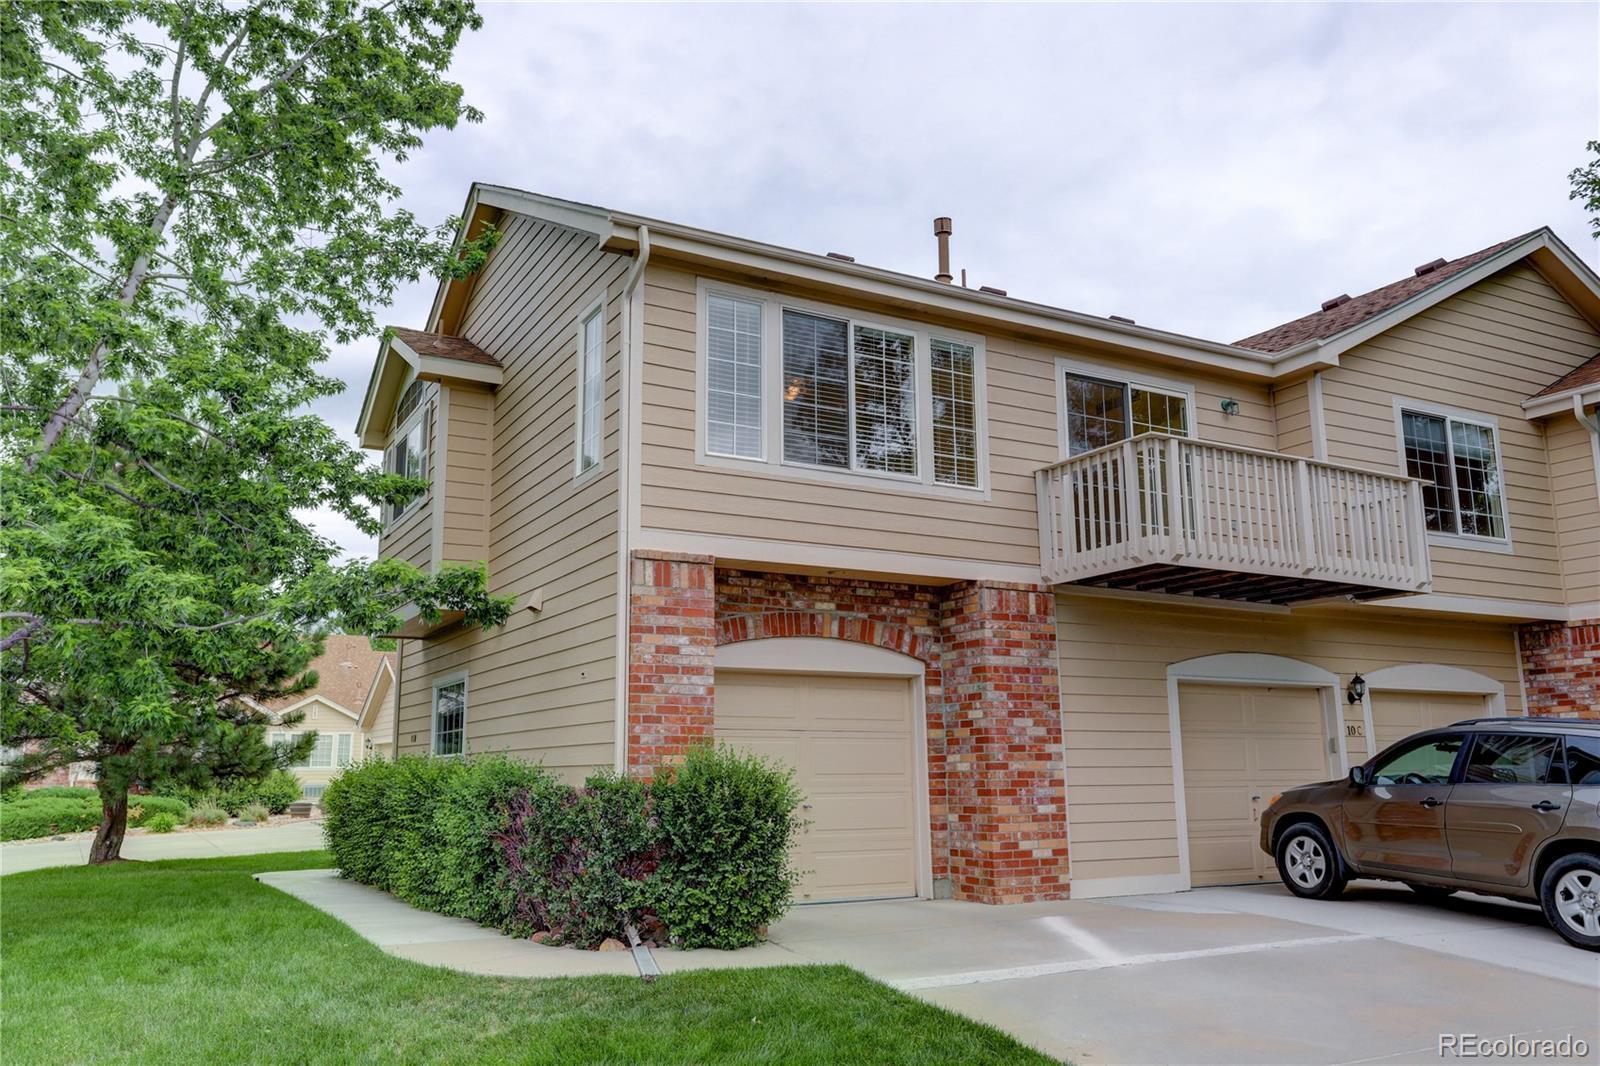 MLS# 2836182 - 5 - 7700 W Grant Ranch Boulevard #10D, Littleton, CO 80123